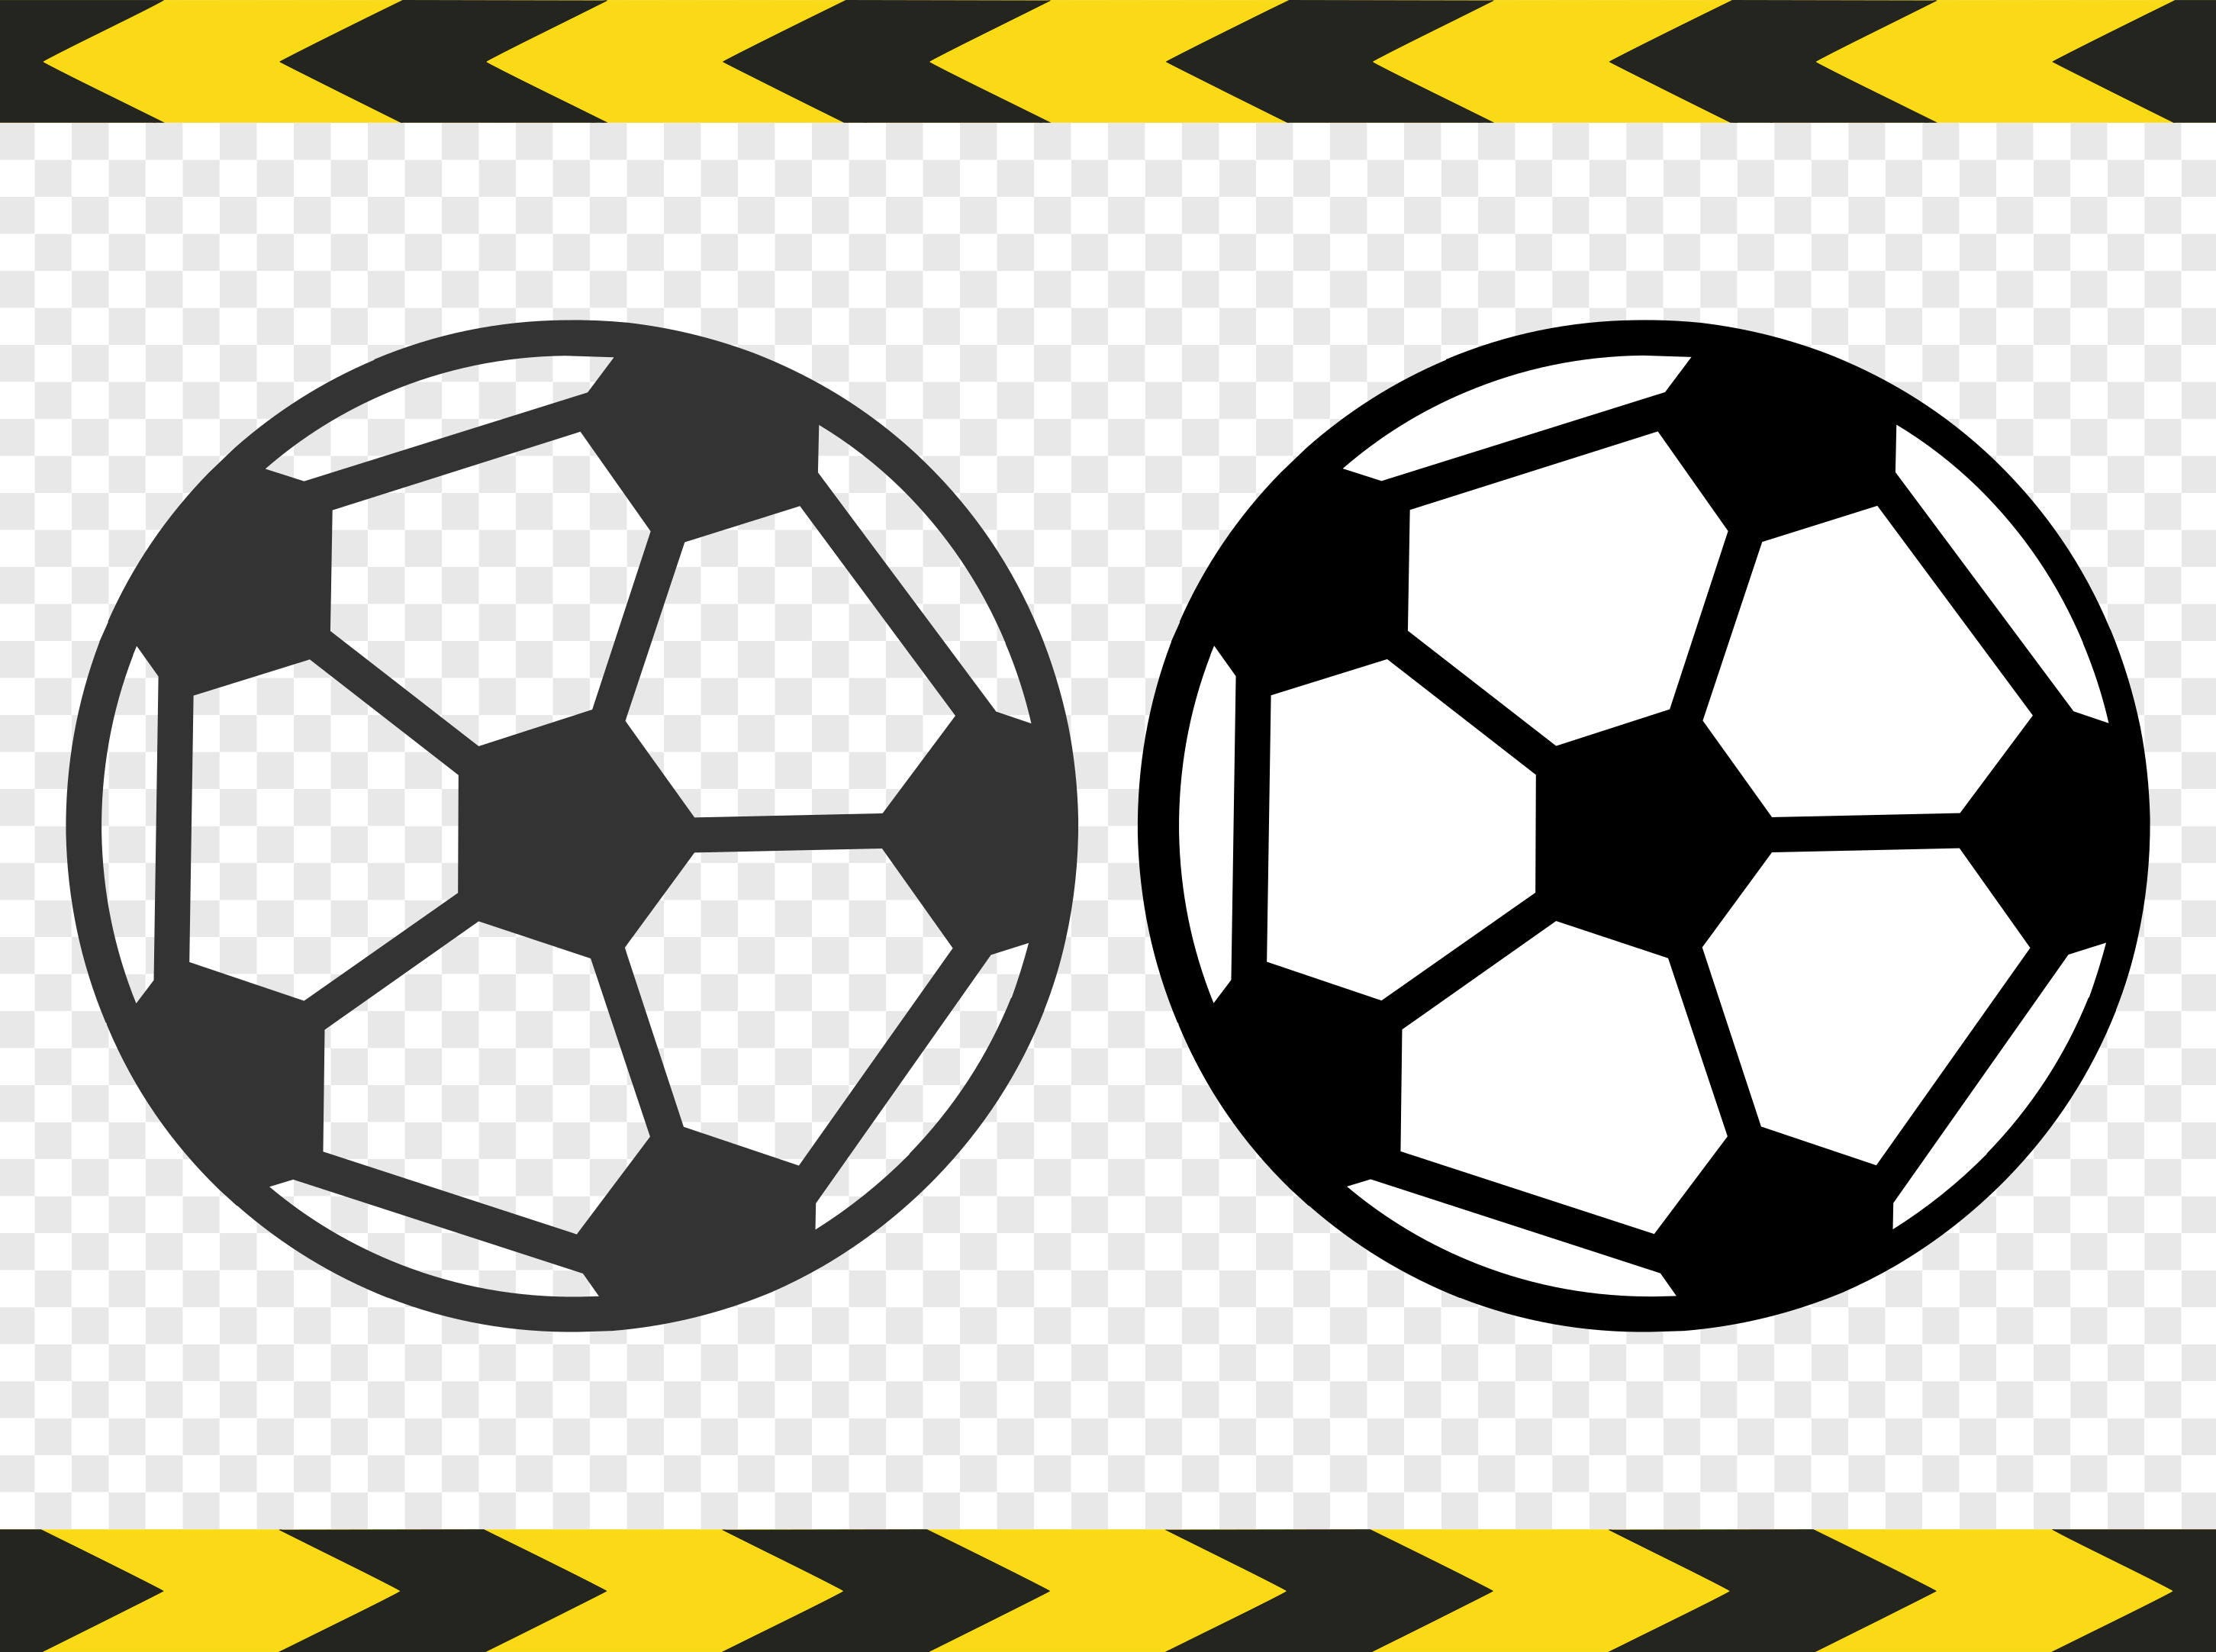 Fútbol Fútbol SVG pelota calcomanía corte archivos de Cricut   Etsy